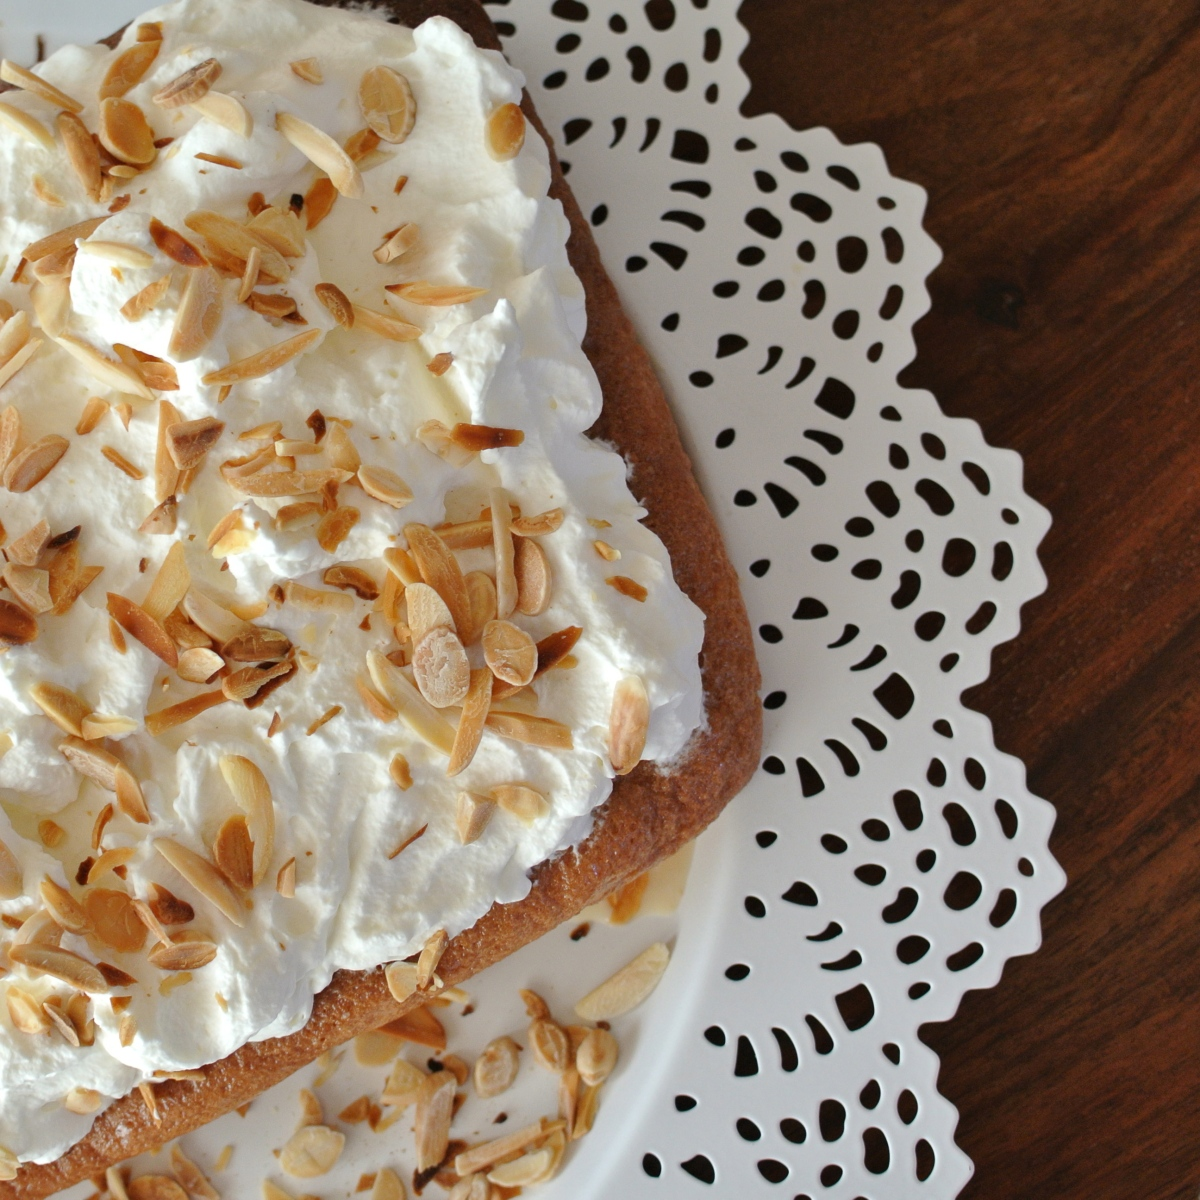 Třímlékový dort (Tres leches)